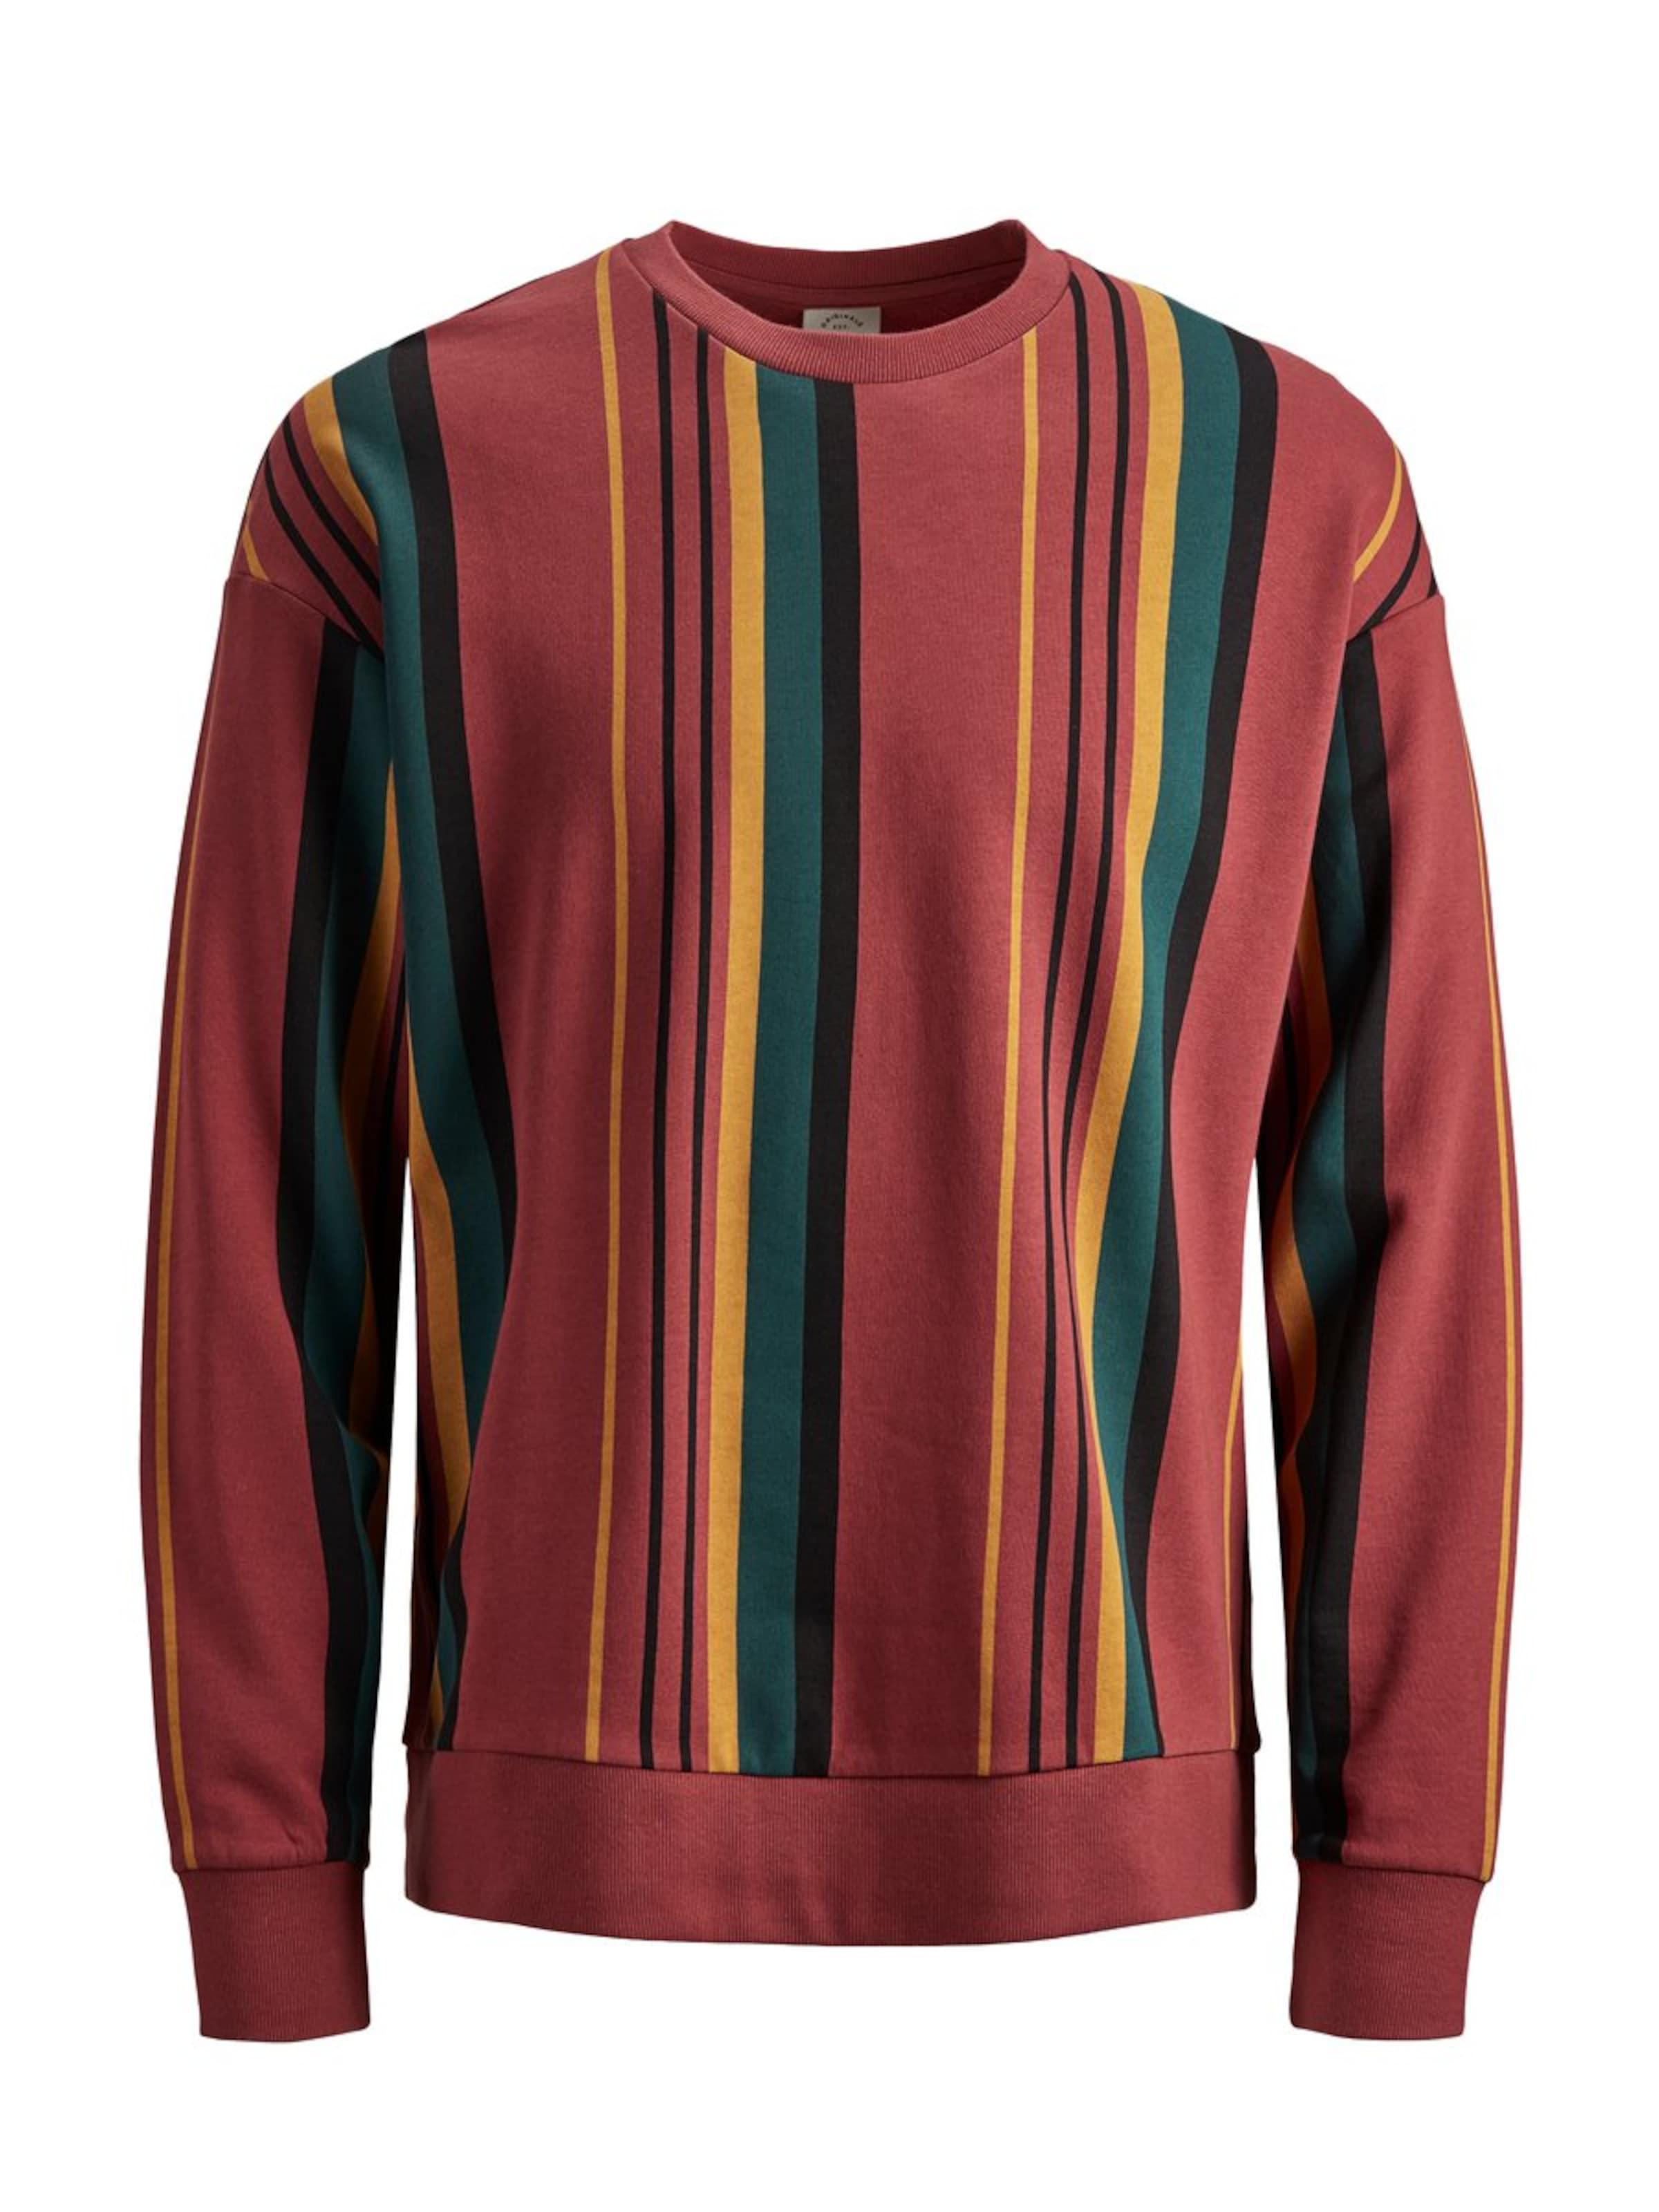 Jackamp; shirt Rouge Sweat Jones Noir Rouille JauneSapin En qGUpzVSM